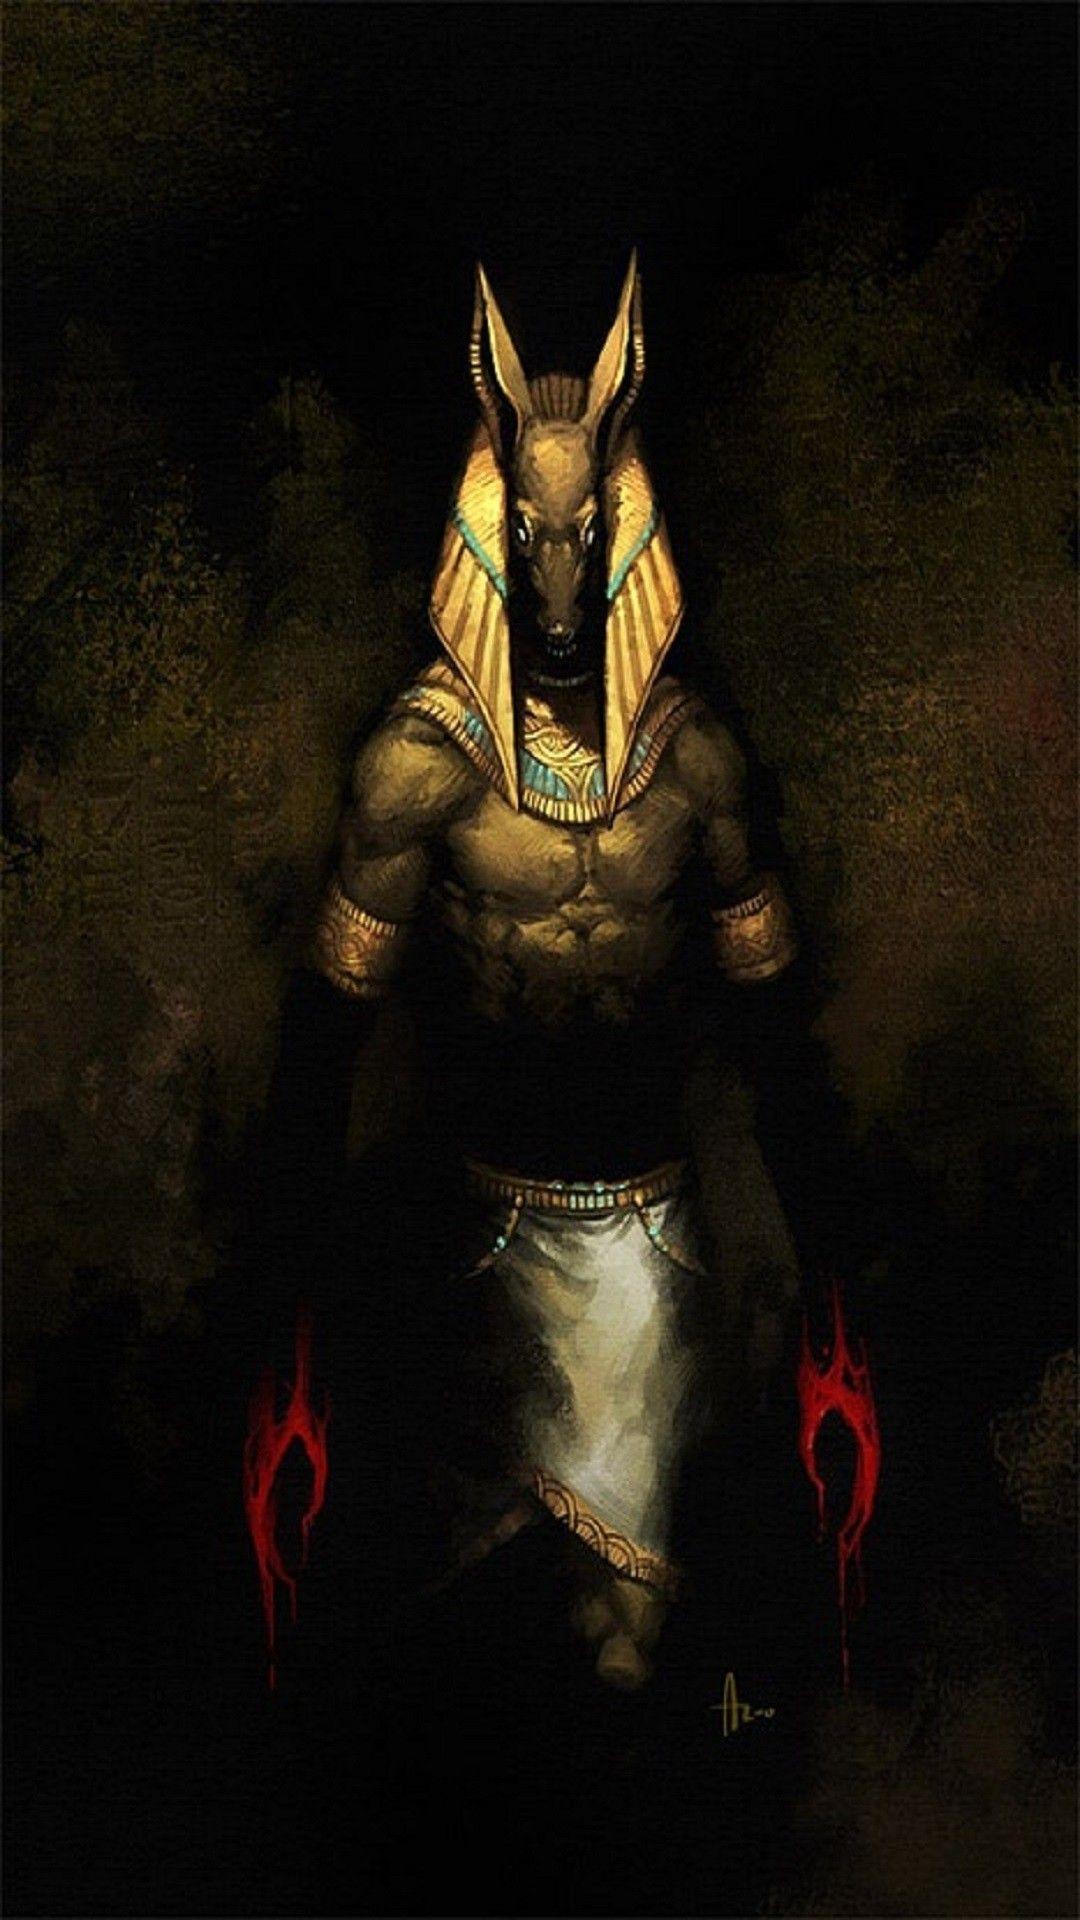 Popular Anubis Egyptian God Wallpaper 1080x1920 Full Hd